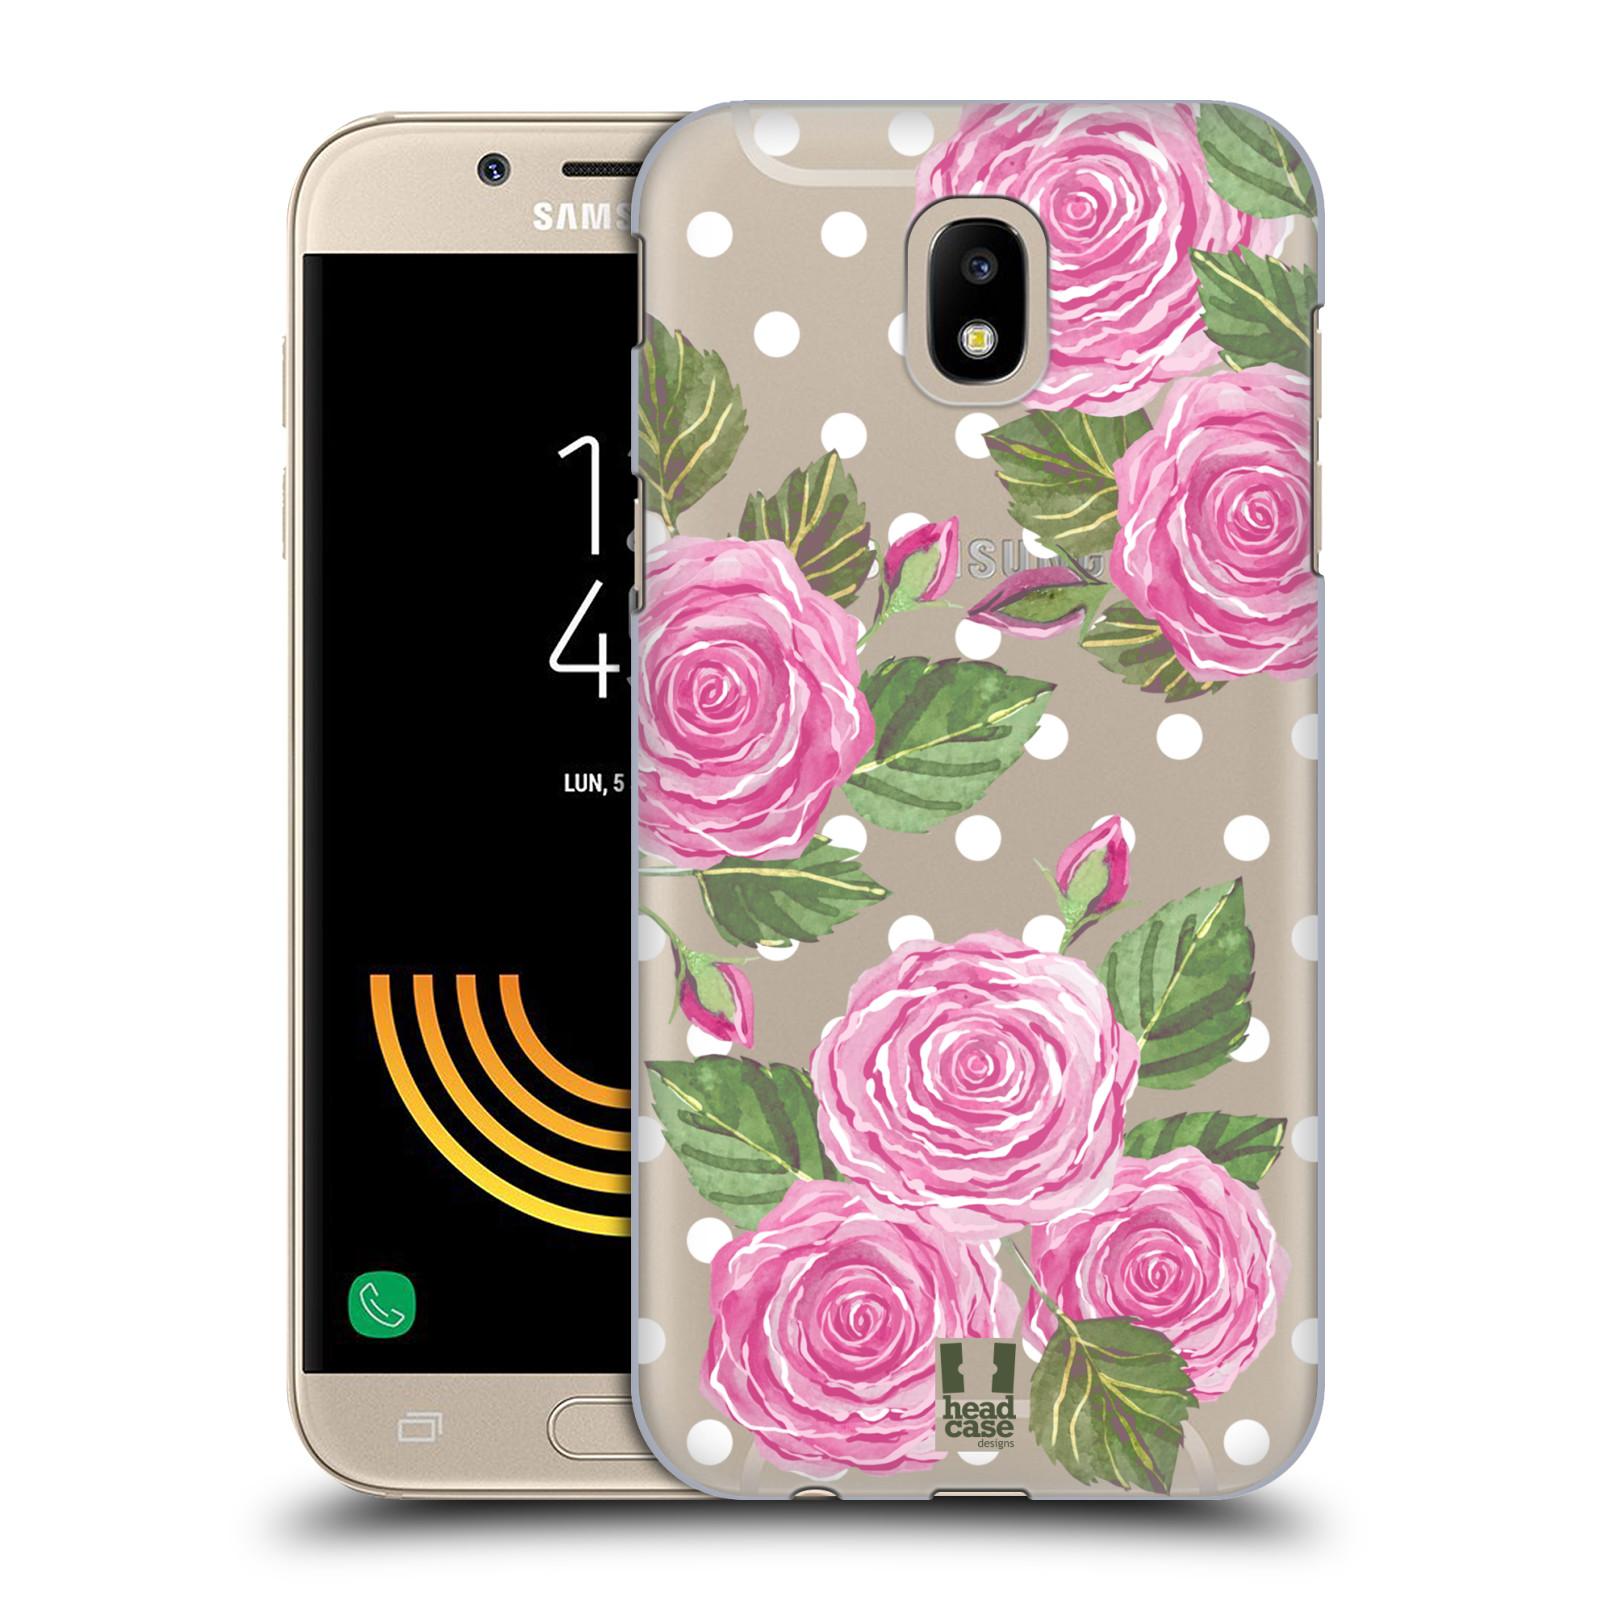 Plastové pouzdro na mobil Samsung Galaxy J5 (2017) - Head Case - Hezoučké růžičky - průhledné